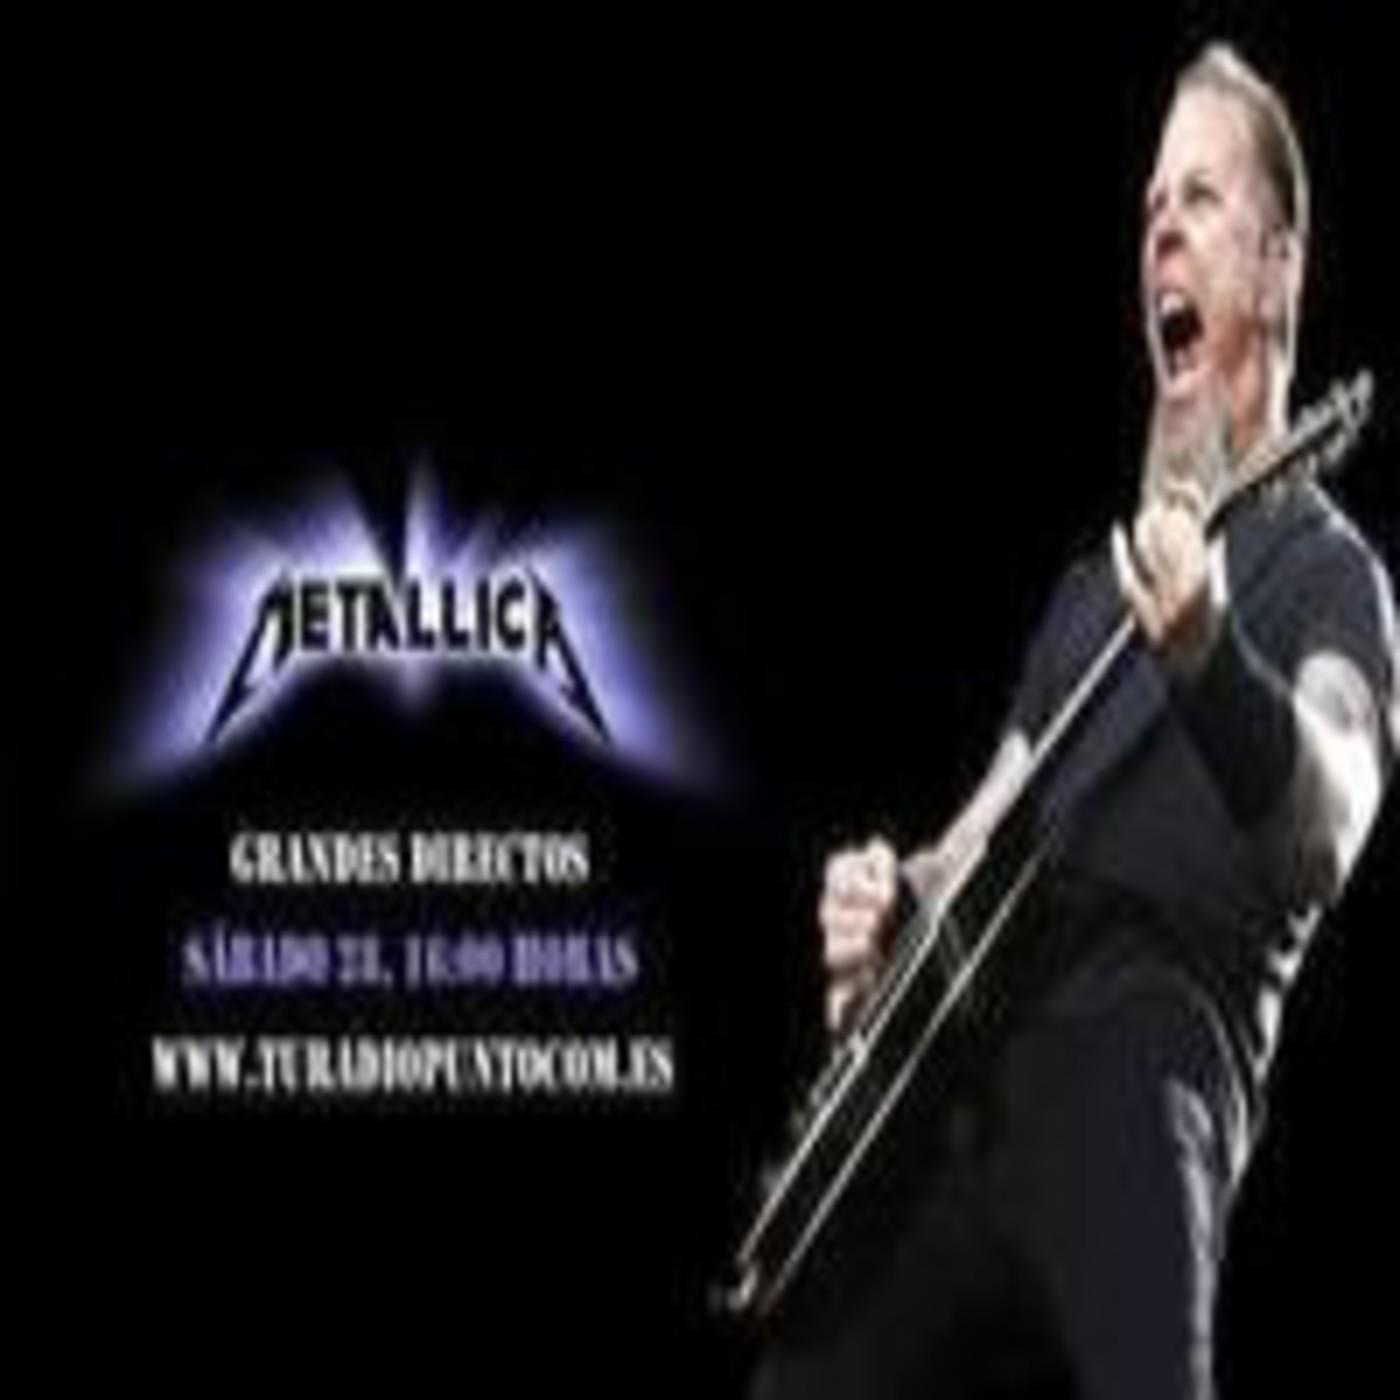 Metallica Live At Nimes 2009 (Emisión 28/06/2014)